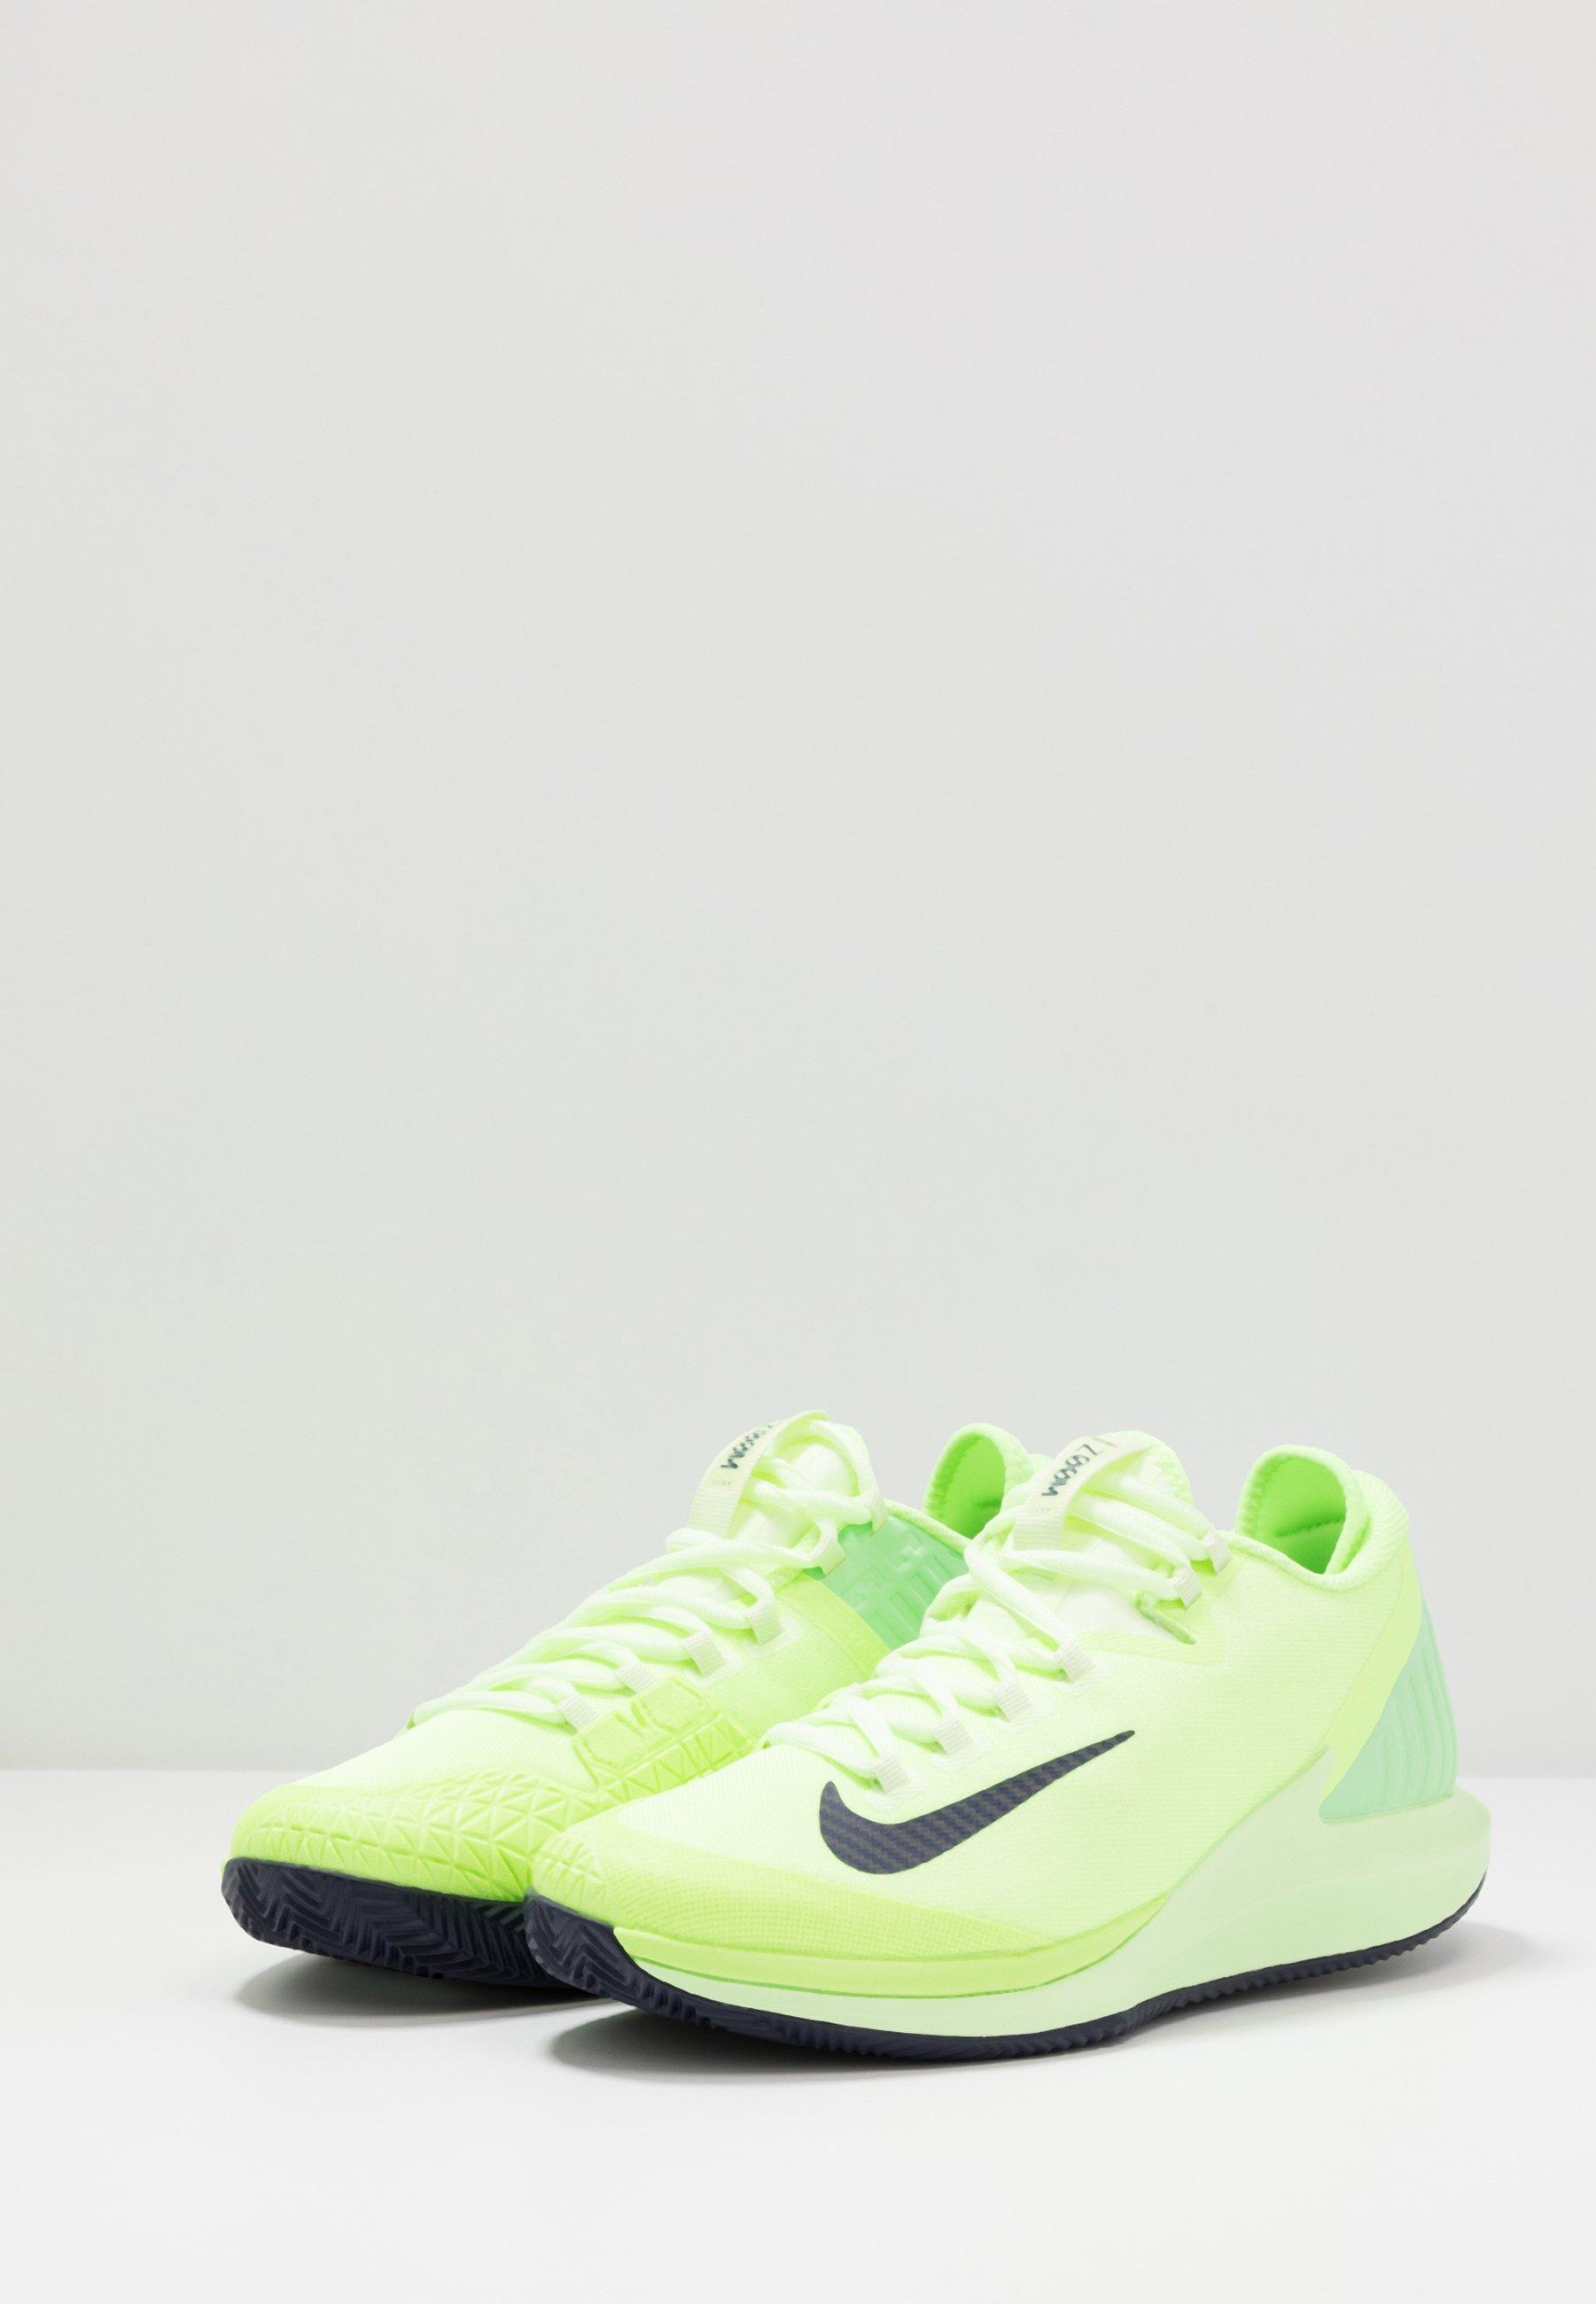 Nike Performance Air Zoom Clay - Da Tennis Per Terra Battuta Ghost Green/blackened Blue/barely Volt Scarpe Scontate